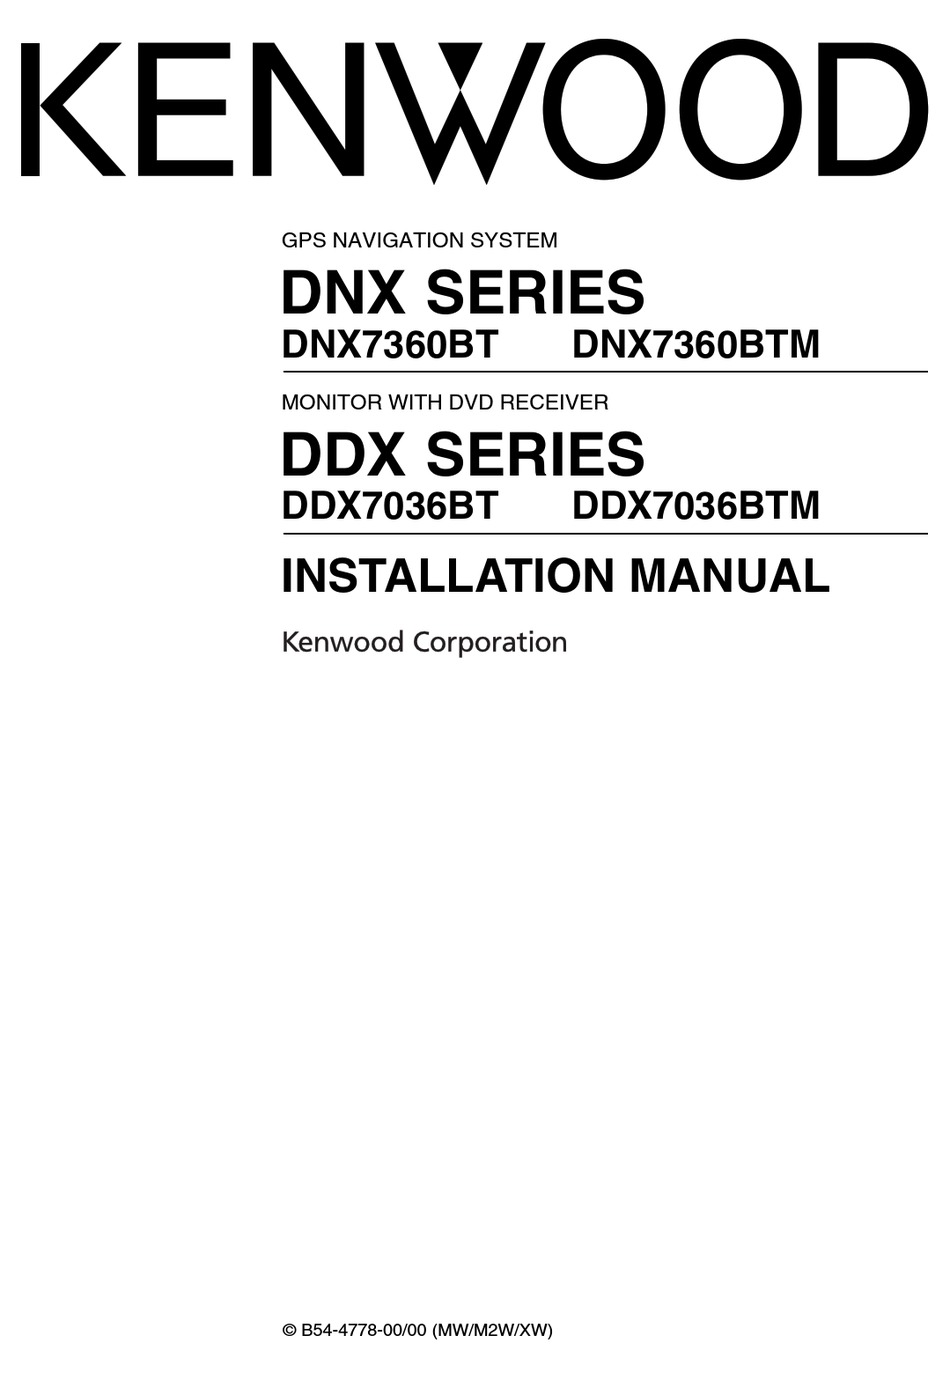 KENWOOD DNX SERIES DDX7036BT INSTALLATION MANUAL Pdf